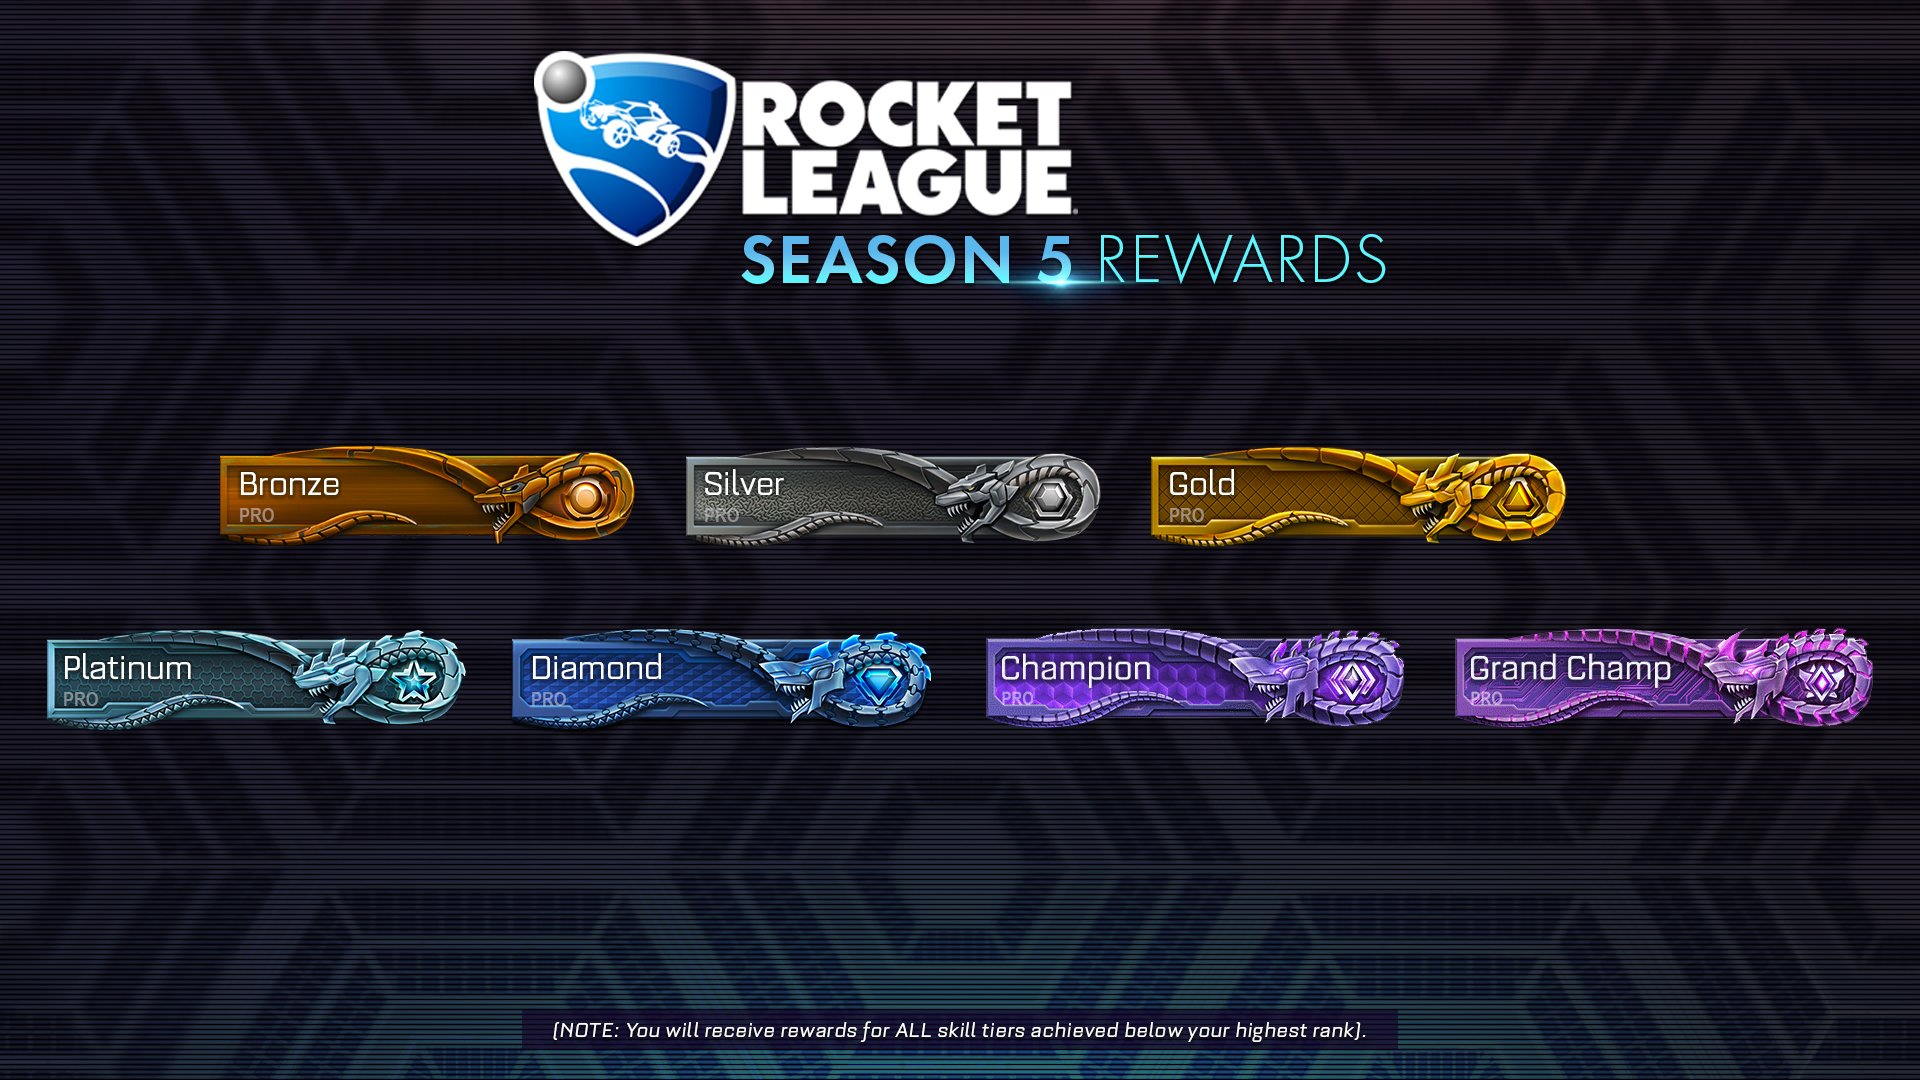 Rocket League players hated dragons, so Psyonix made ...